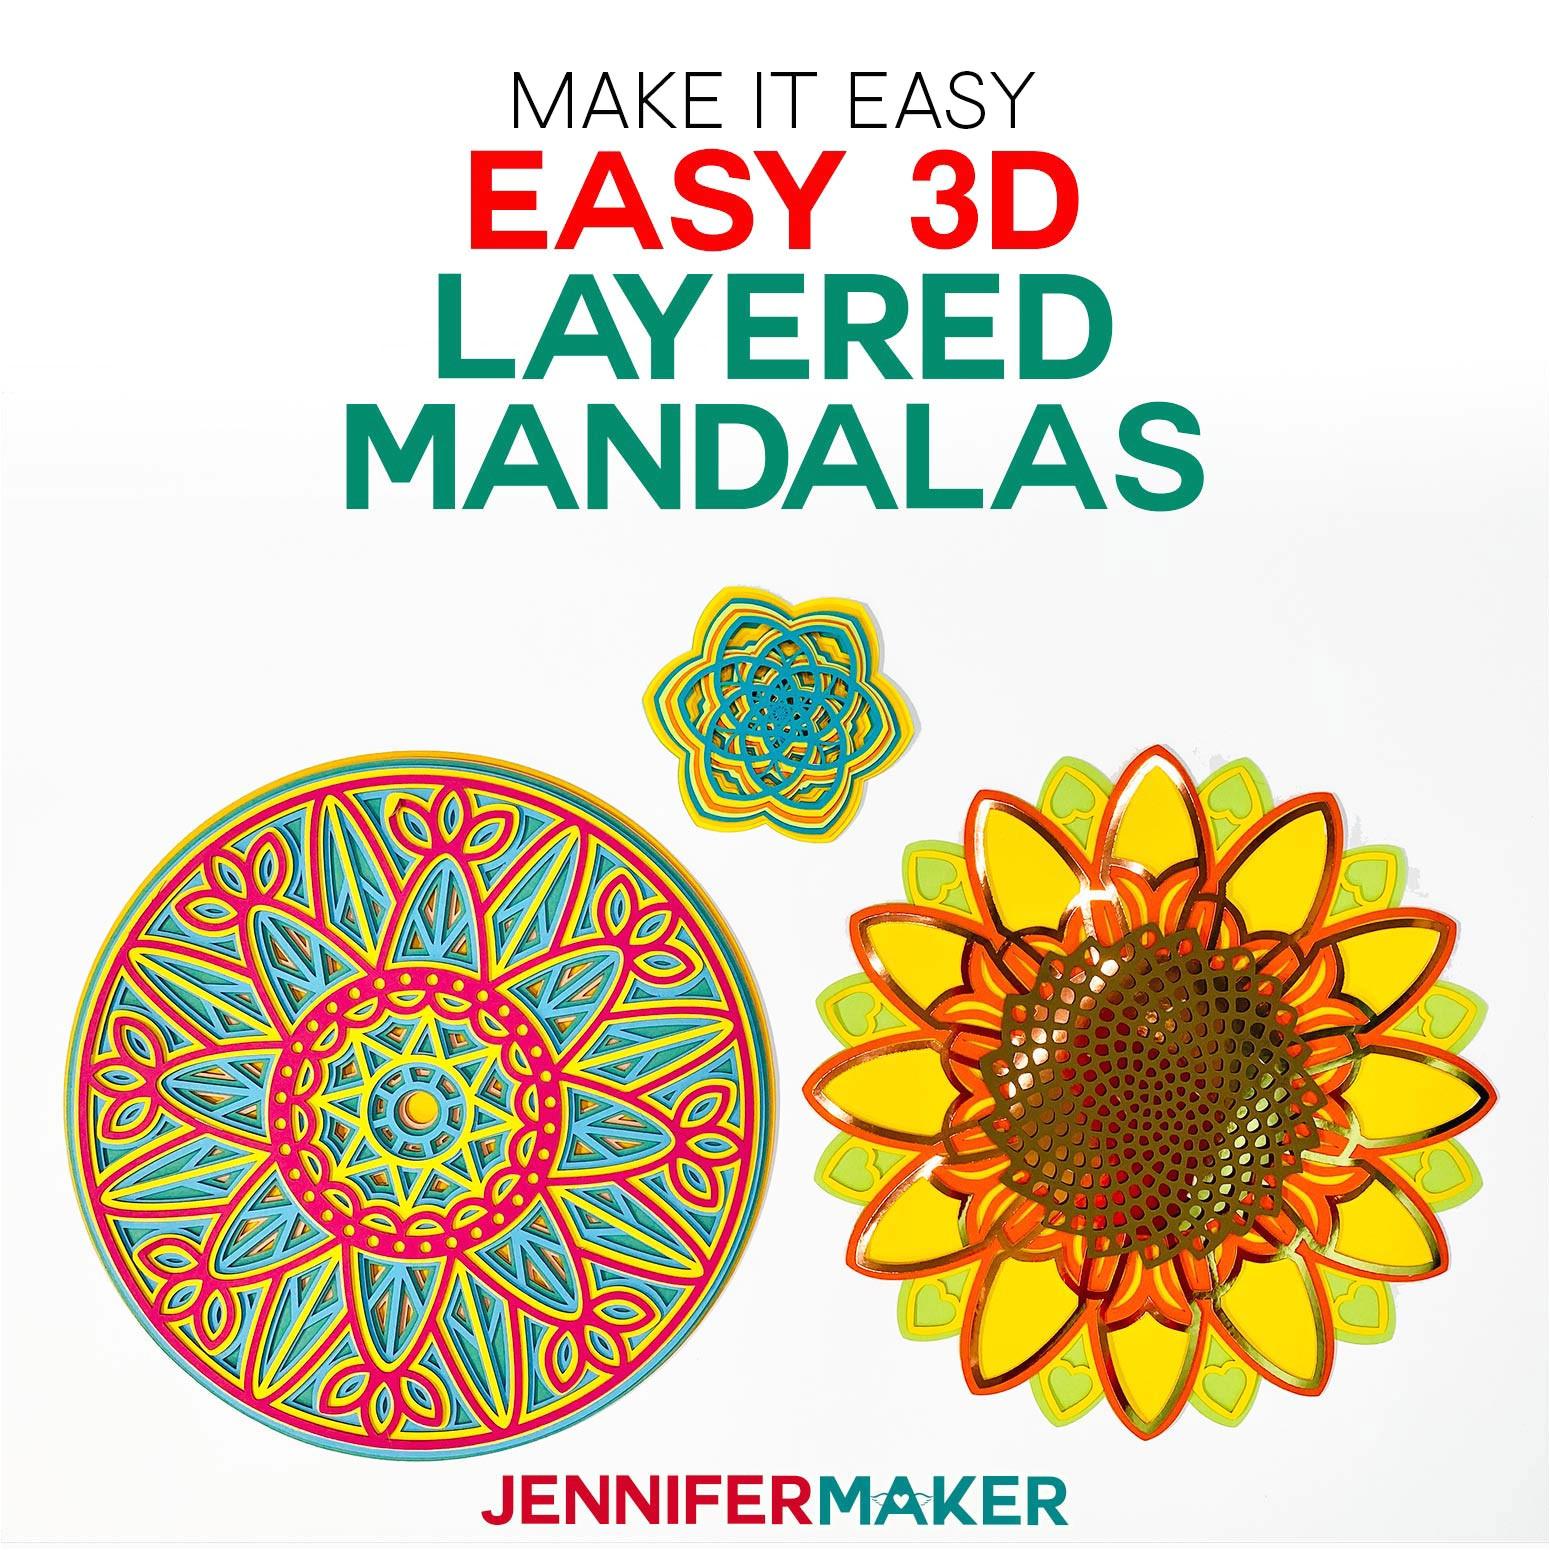 3d layered mandala easy f2 jpg